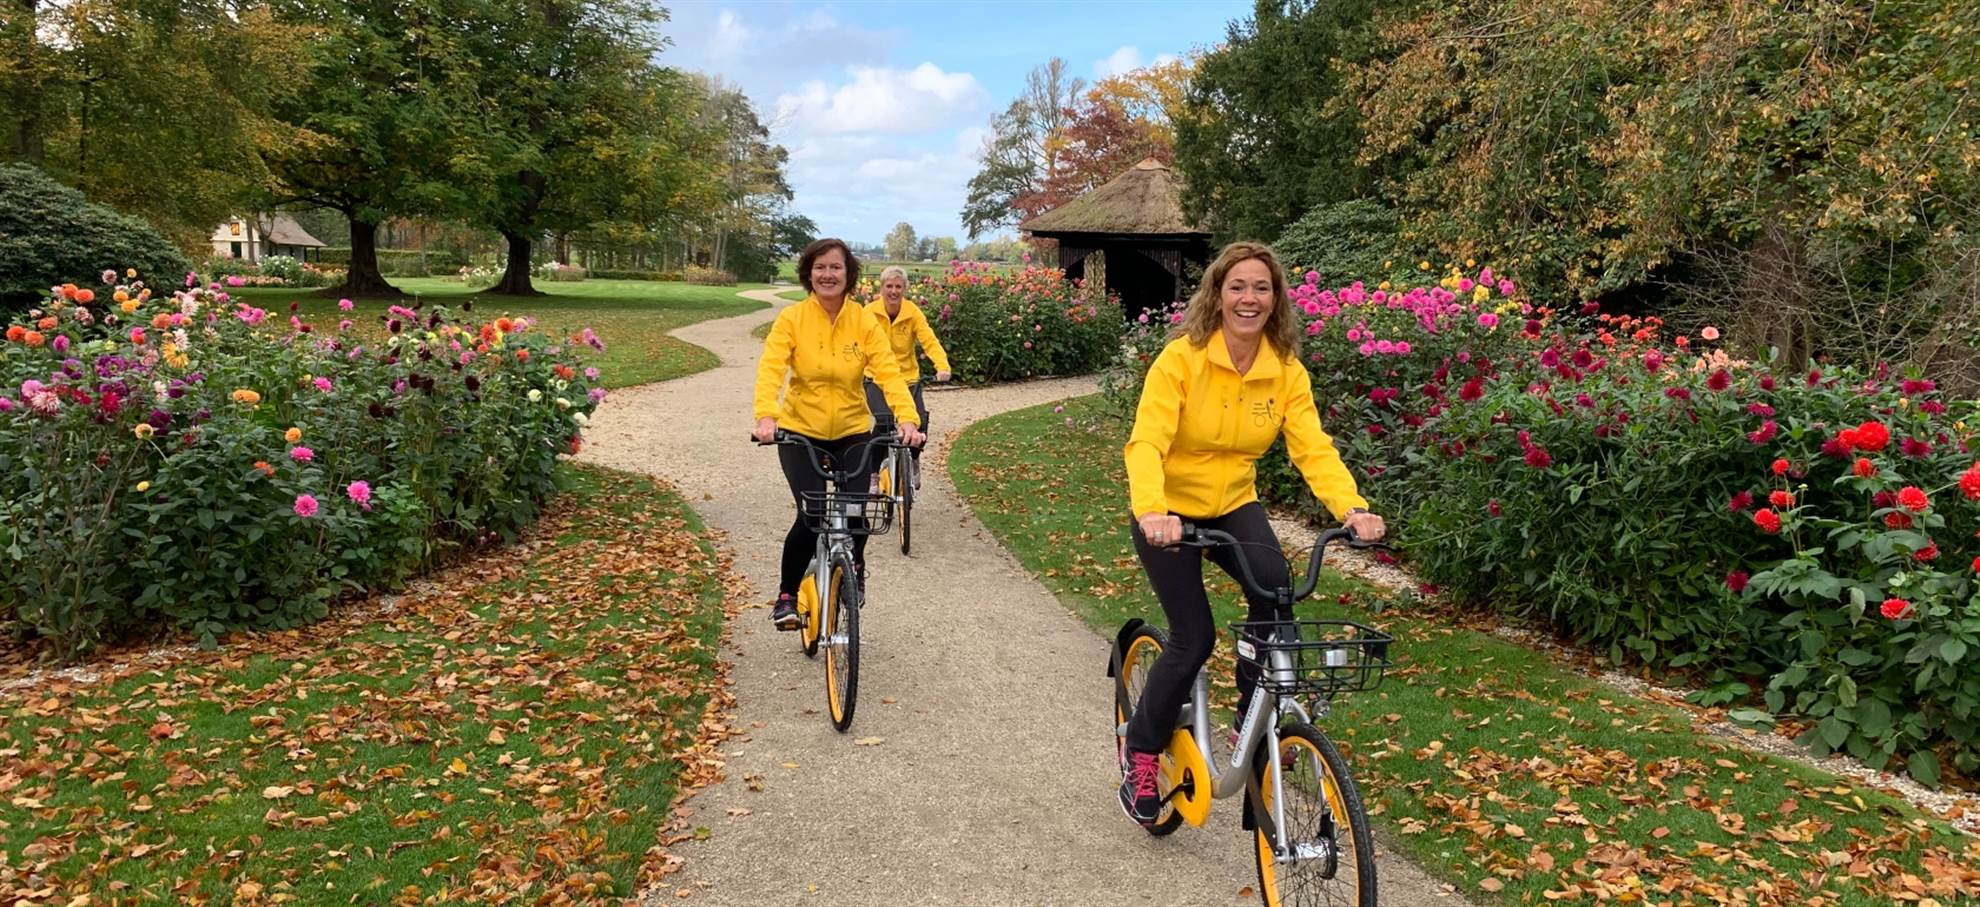 Balade guidée en vélo autour de Keukenhof